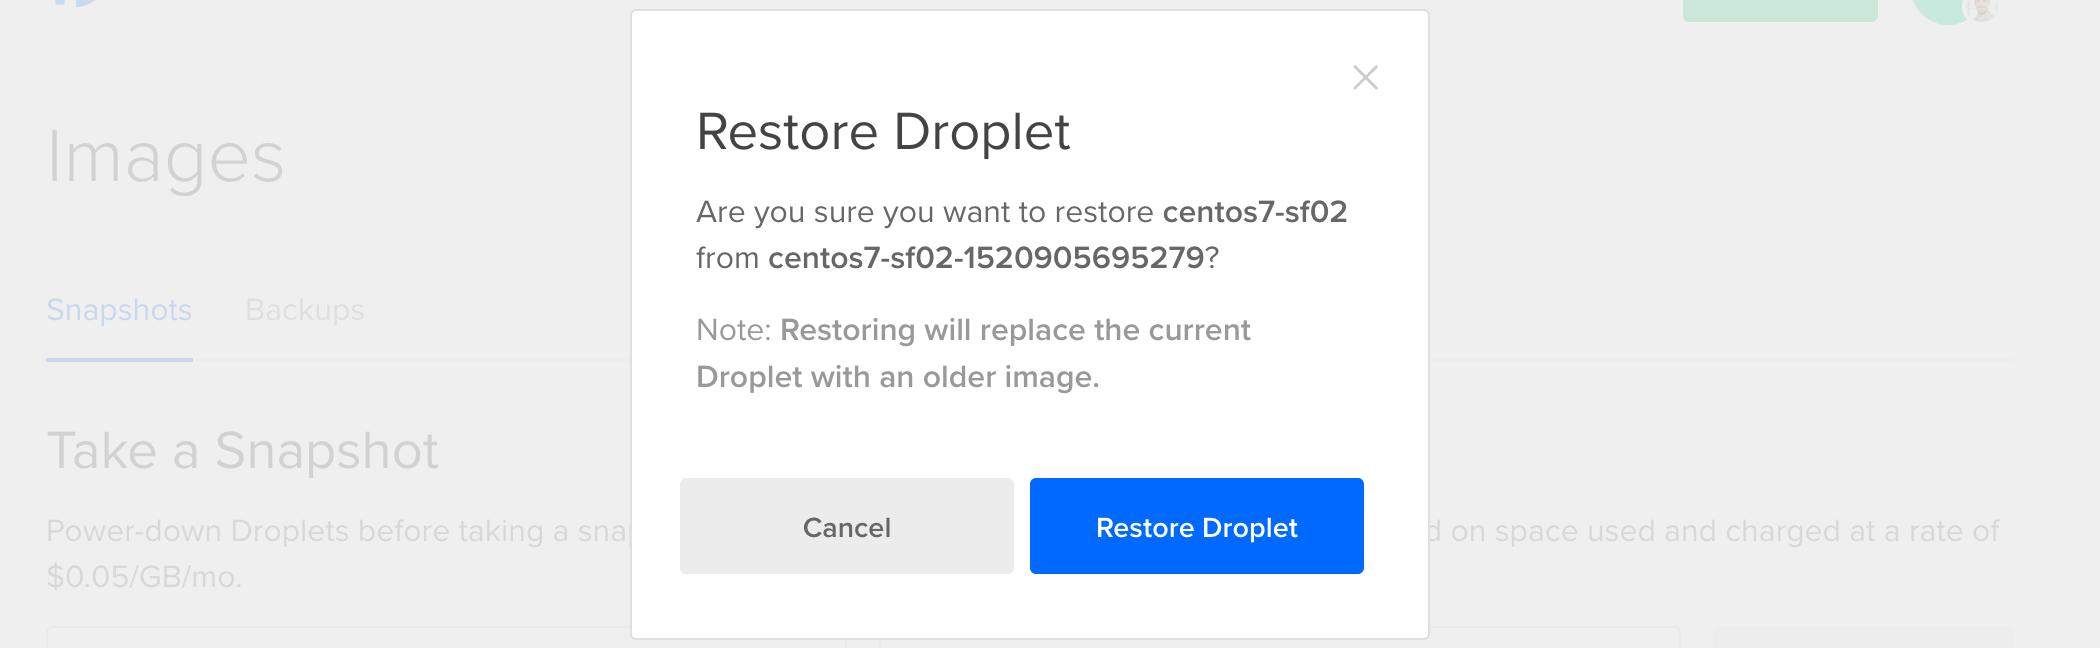 Restore Droplet Confirmation